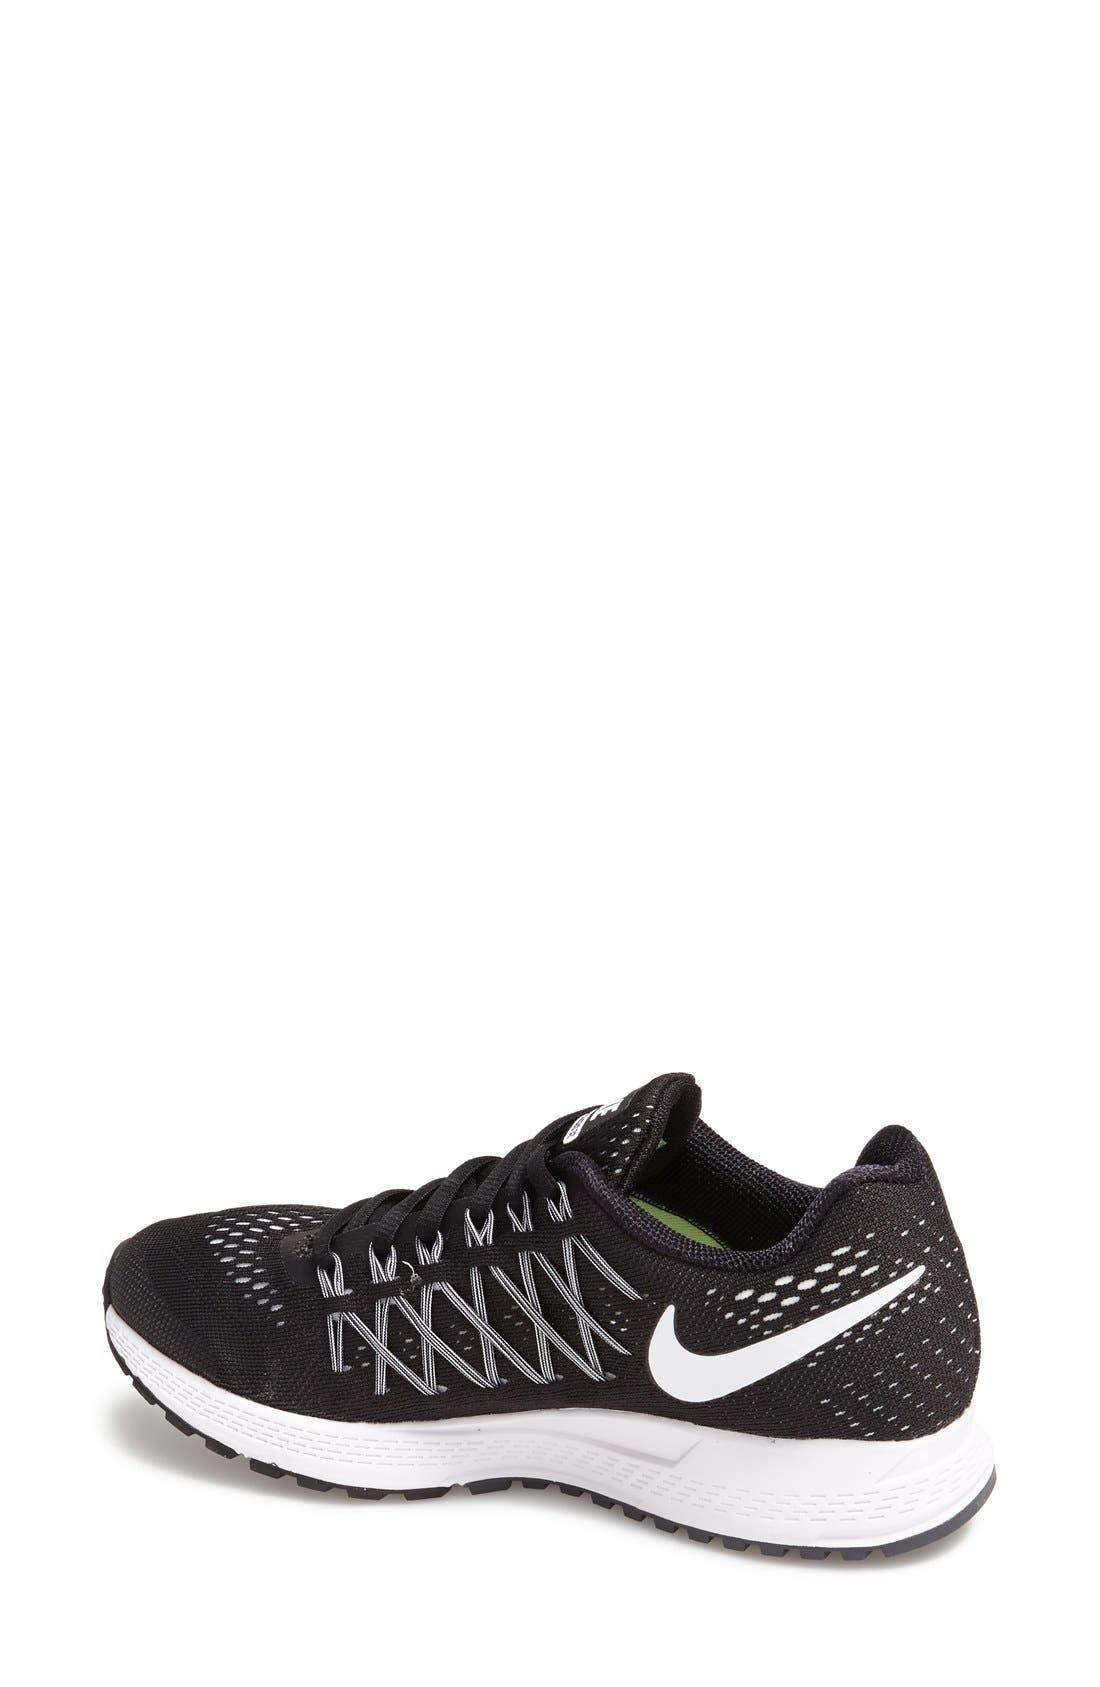 'Zoom Pegasus 32' Running Shoe,                             Alternate thumbnail 2, color,                             Black/ White/ Pure Platinum